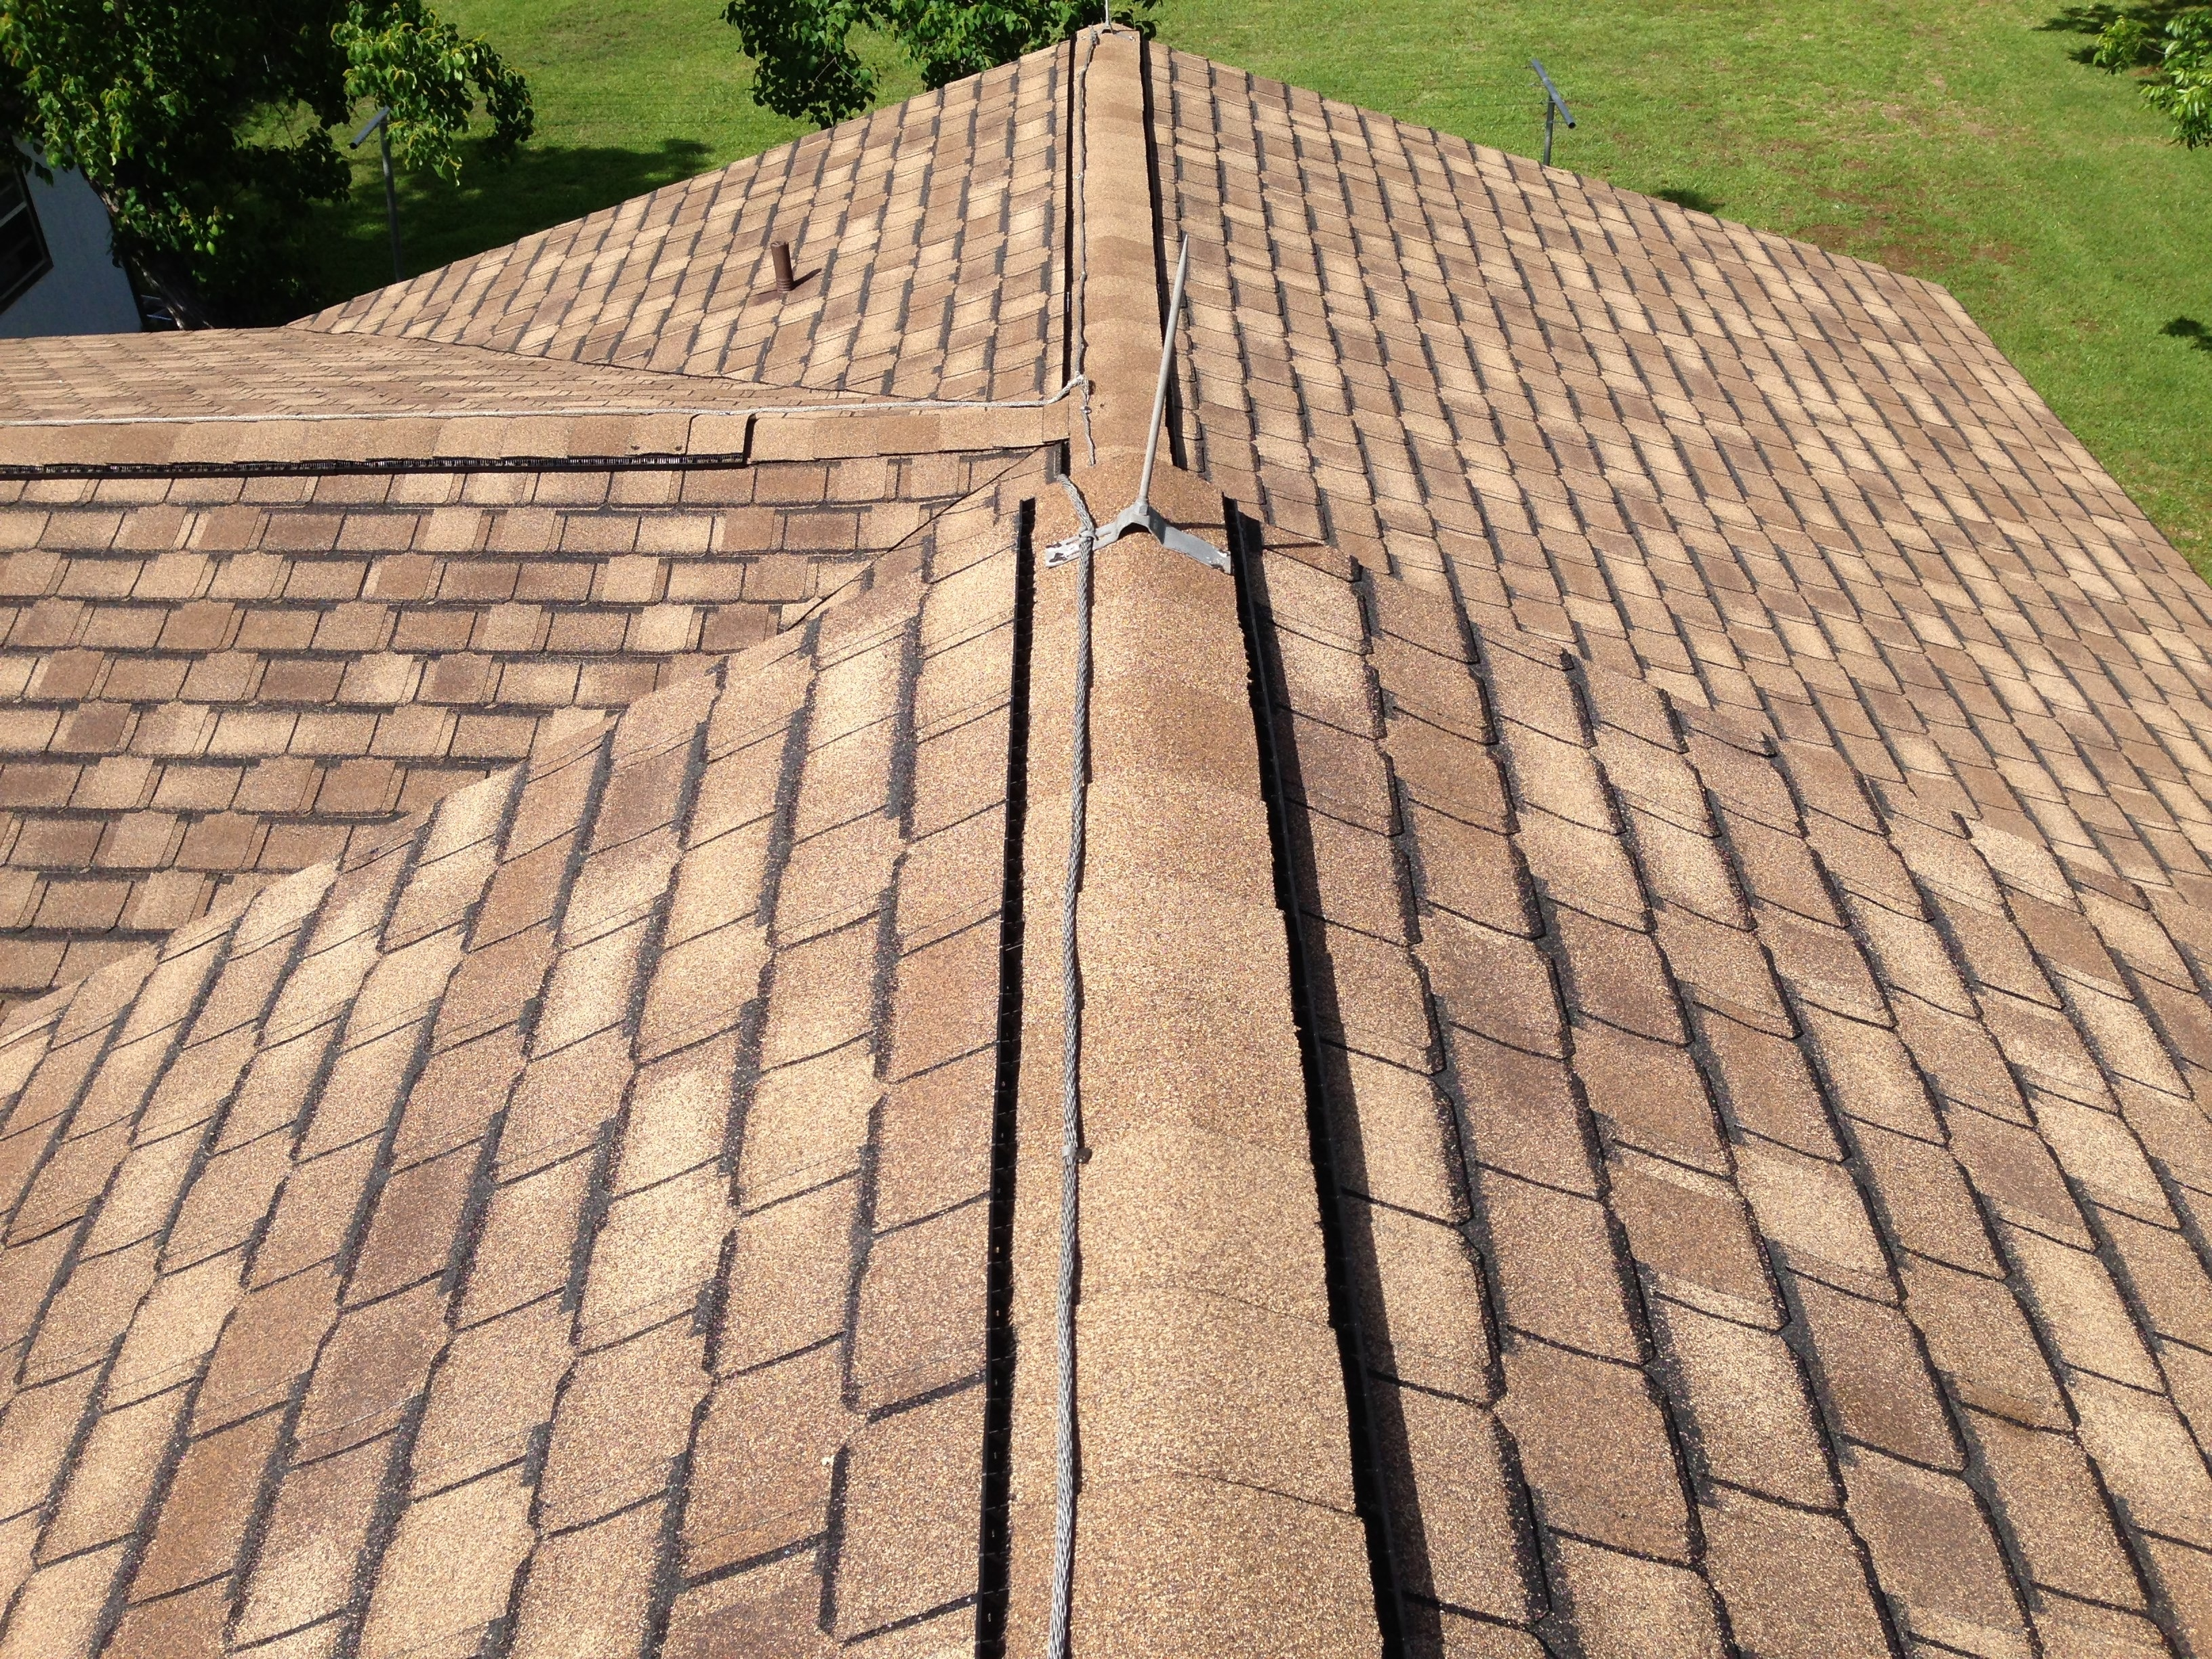 Texan Roofing image 3